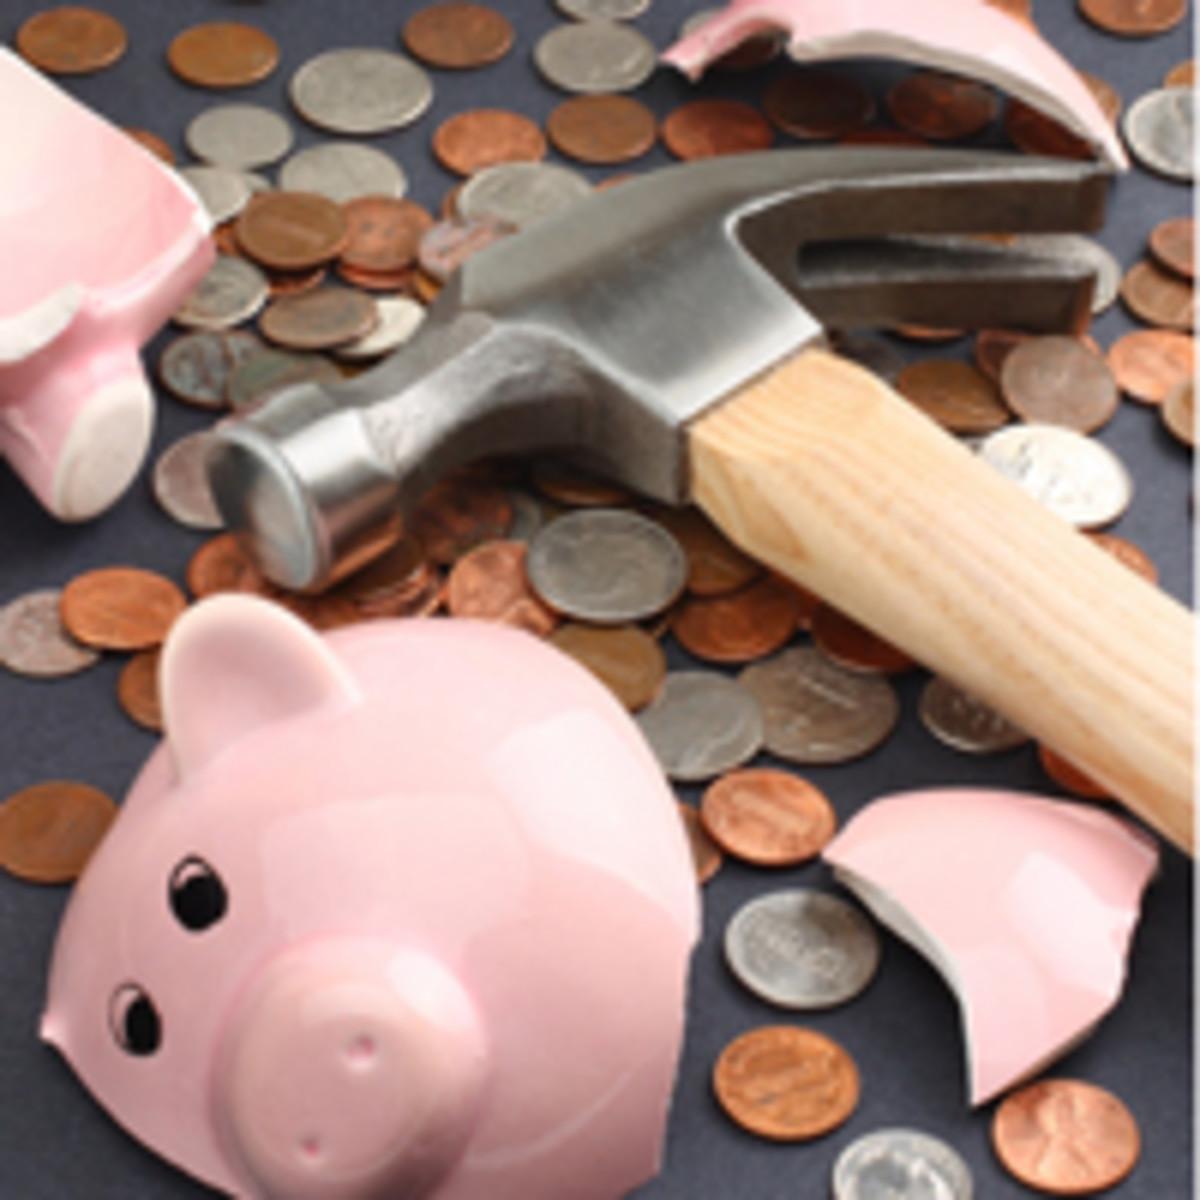 piggy bank hammer coins change cash